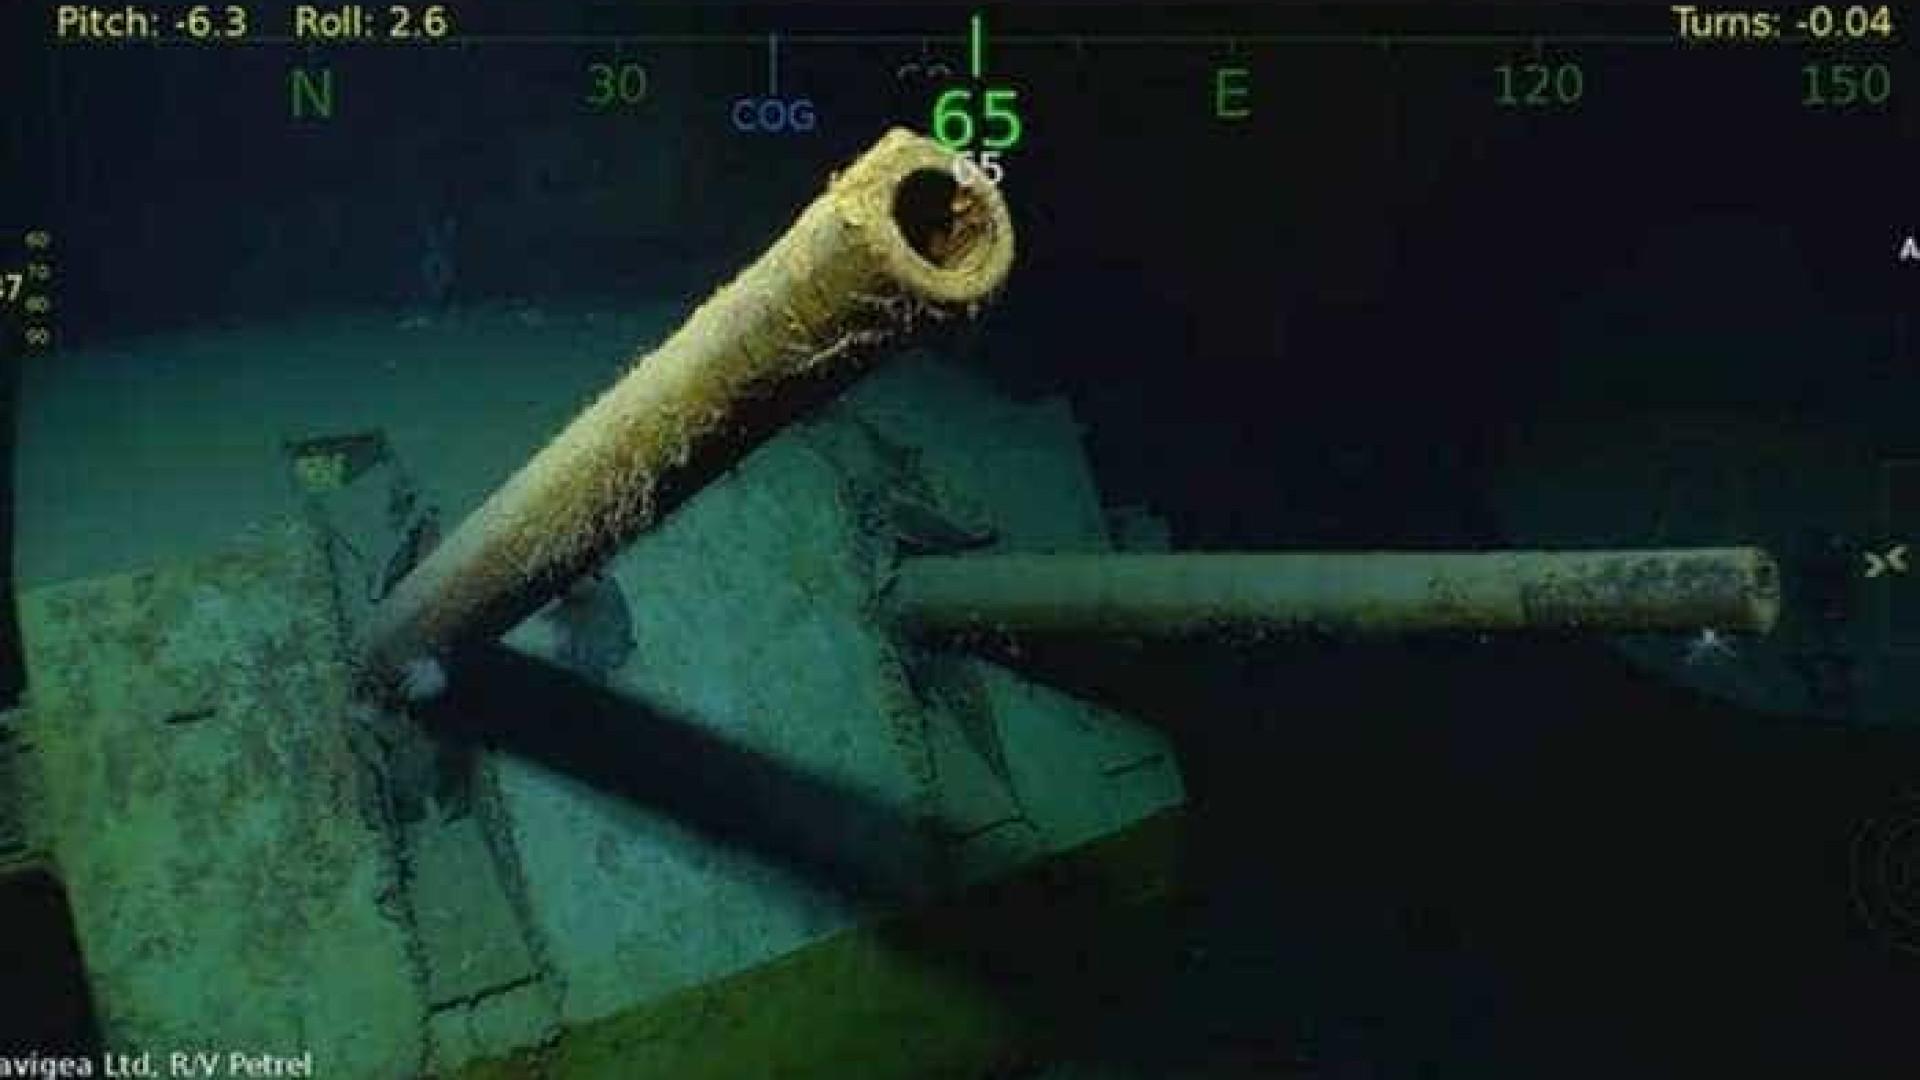 Navio norte-americado é encontrado no Pacífico 76 anos após naufrágio